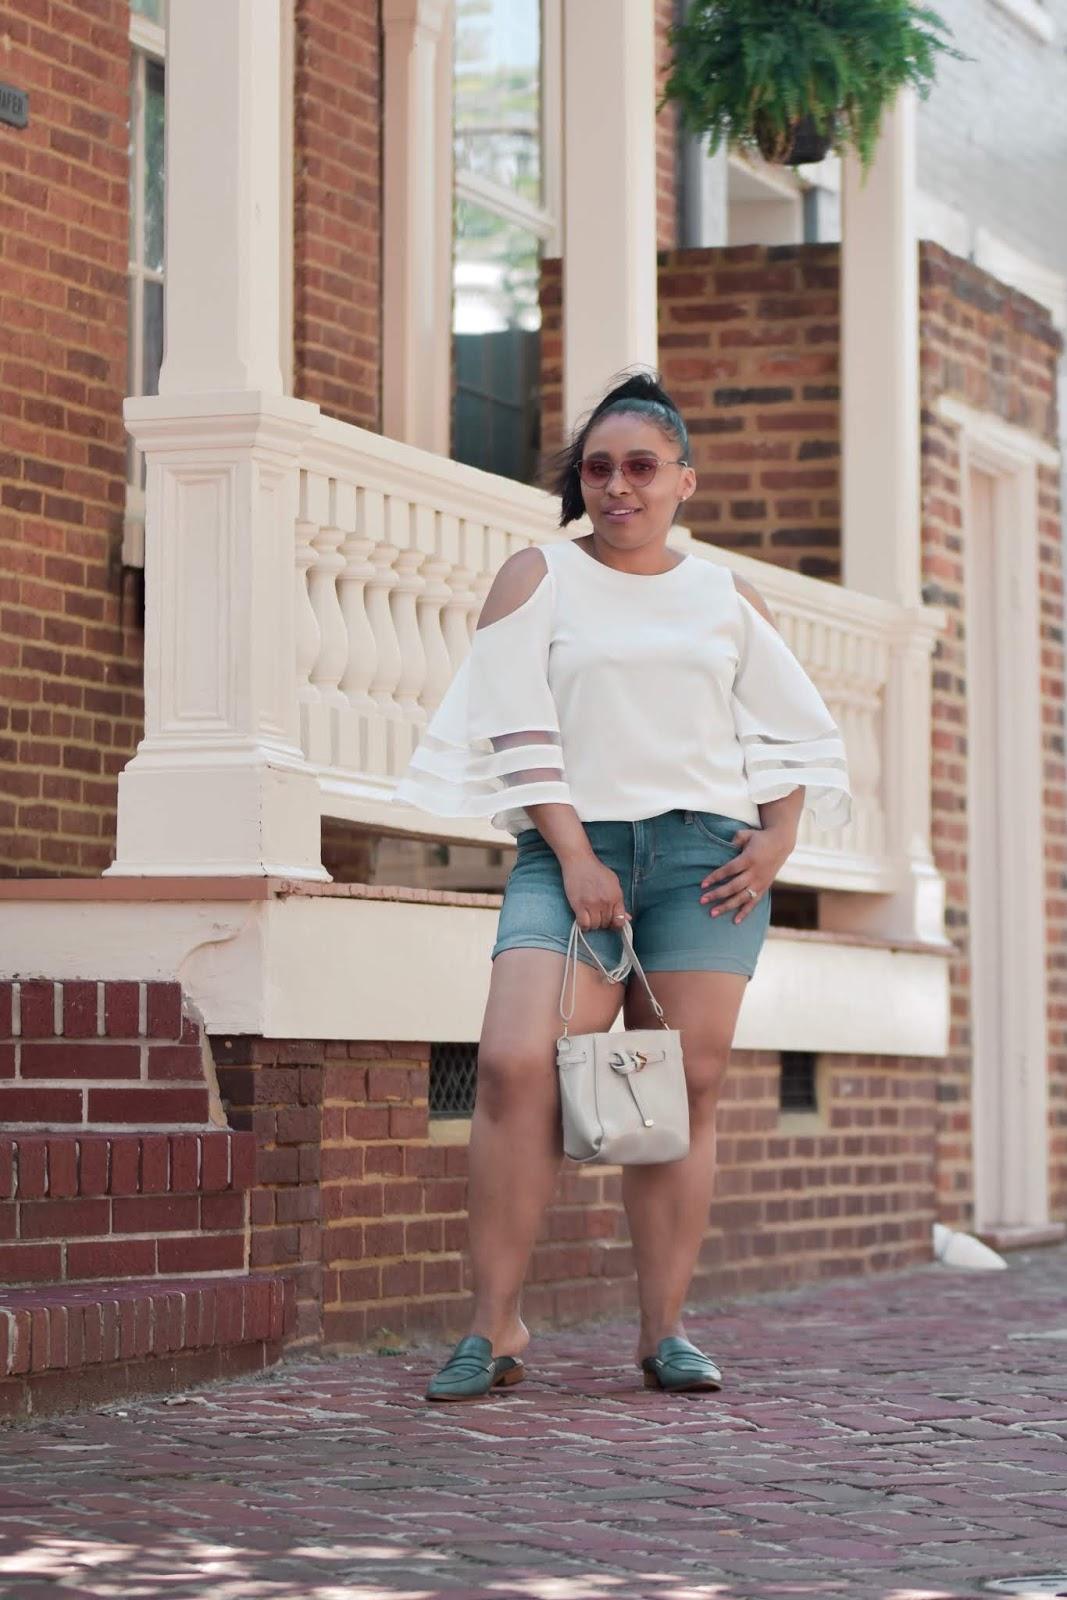 Lookbook store, summer outfit ideas, shoulder cutoffs, cold shoulder, cut offs, shorts